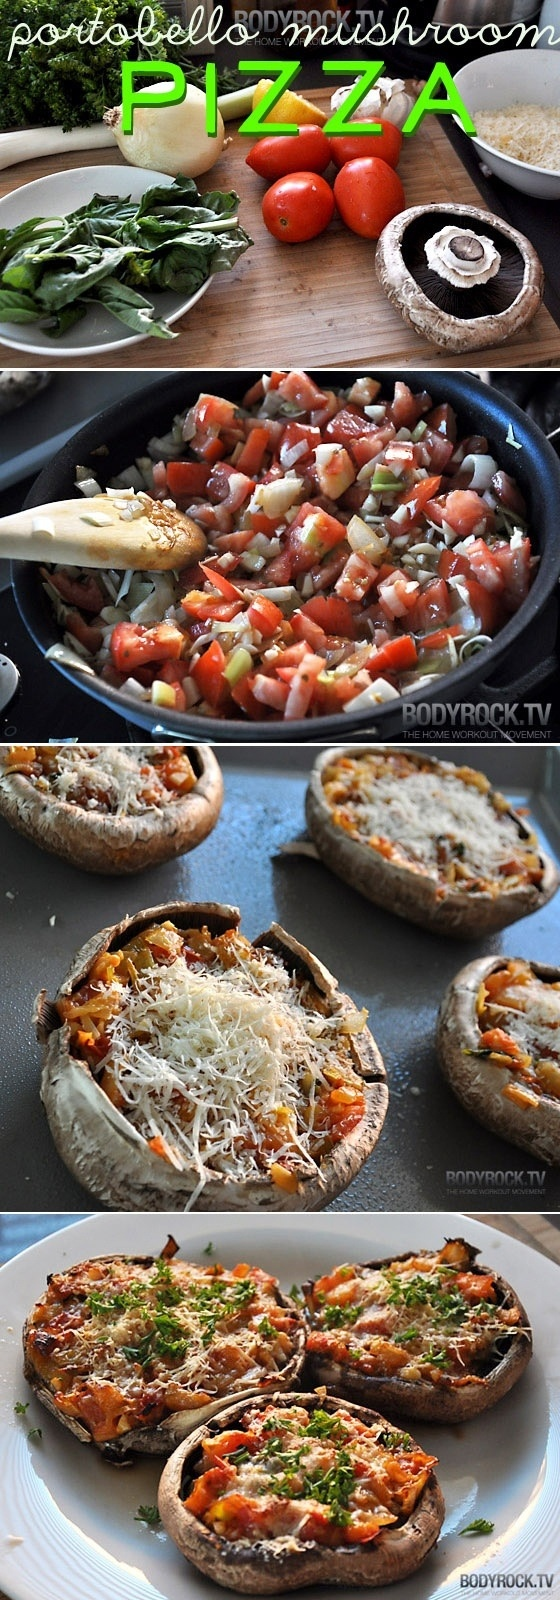 Portabella mushroom pizza - 4 tomatoes, 4 large portobello mushrooms ...